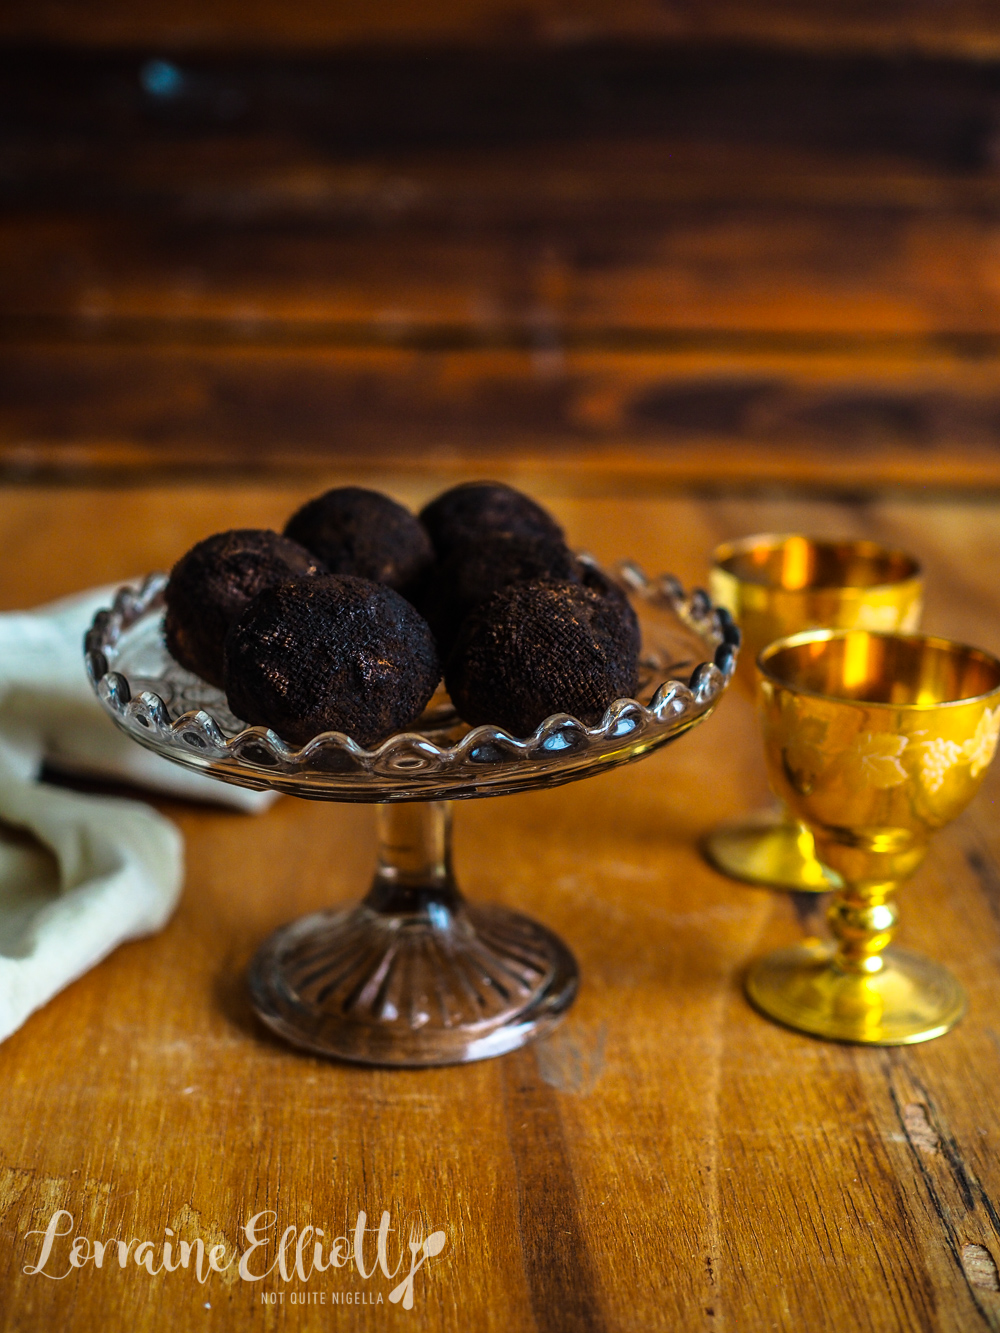 Chocolate Rum Truffles That Look Like Truffles